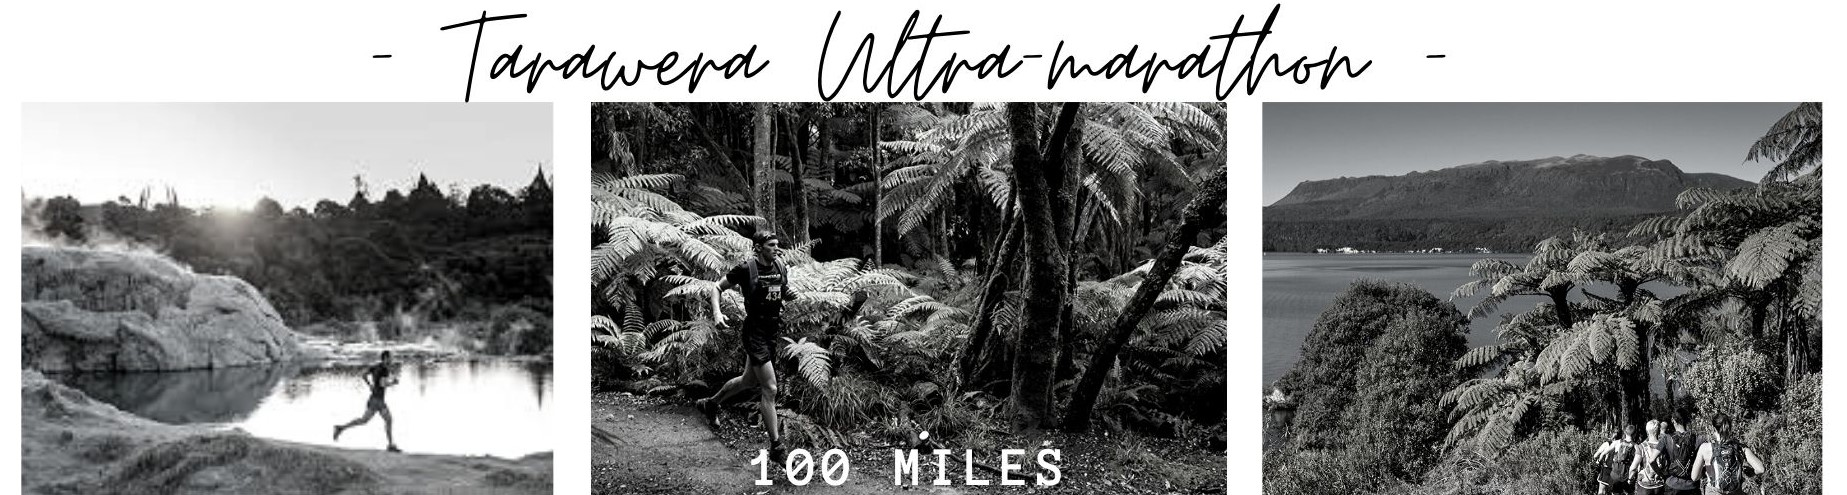 tarawera ultra marathon trail